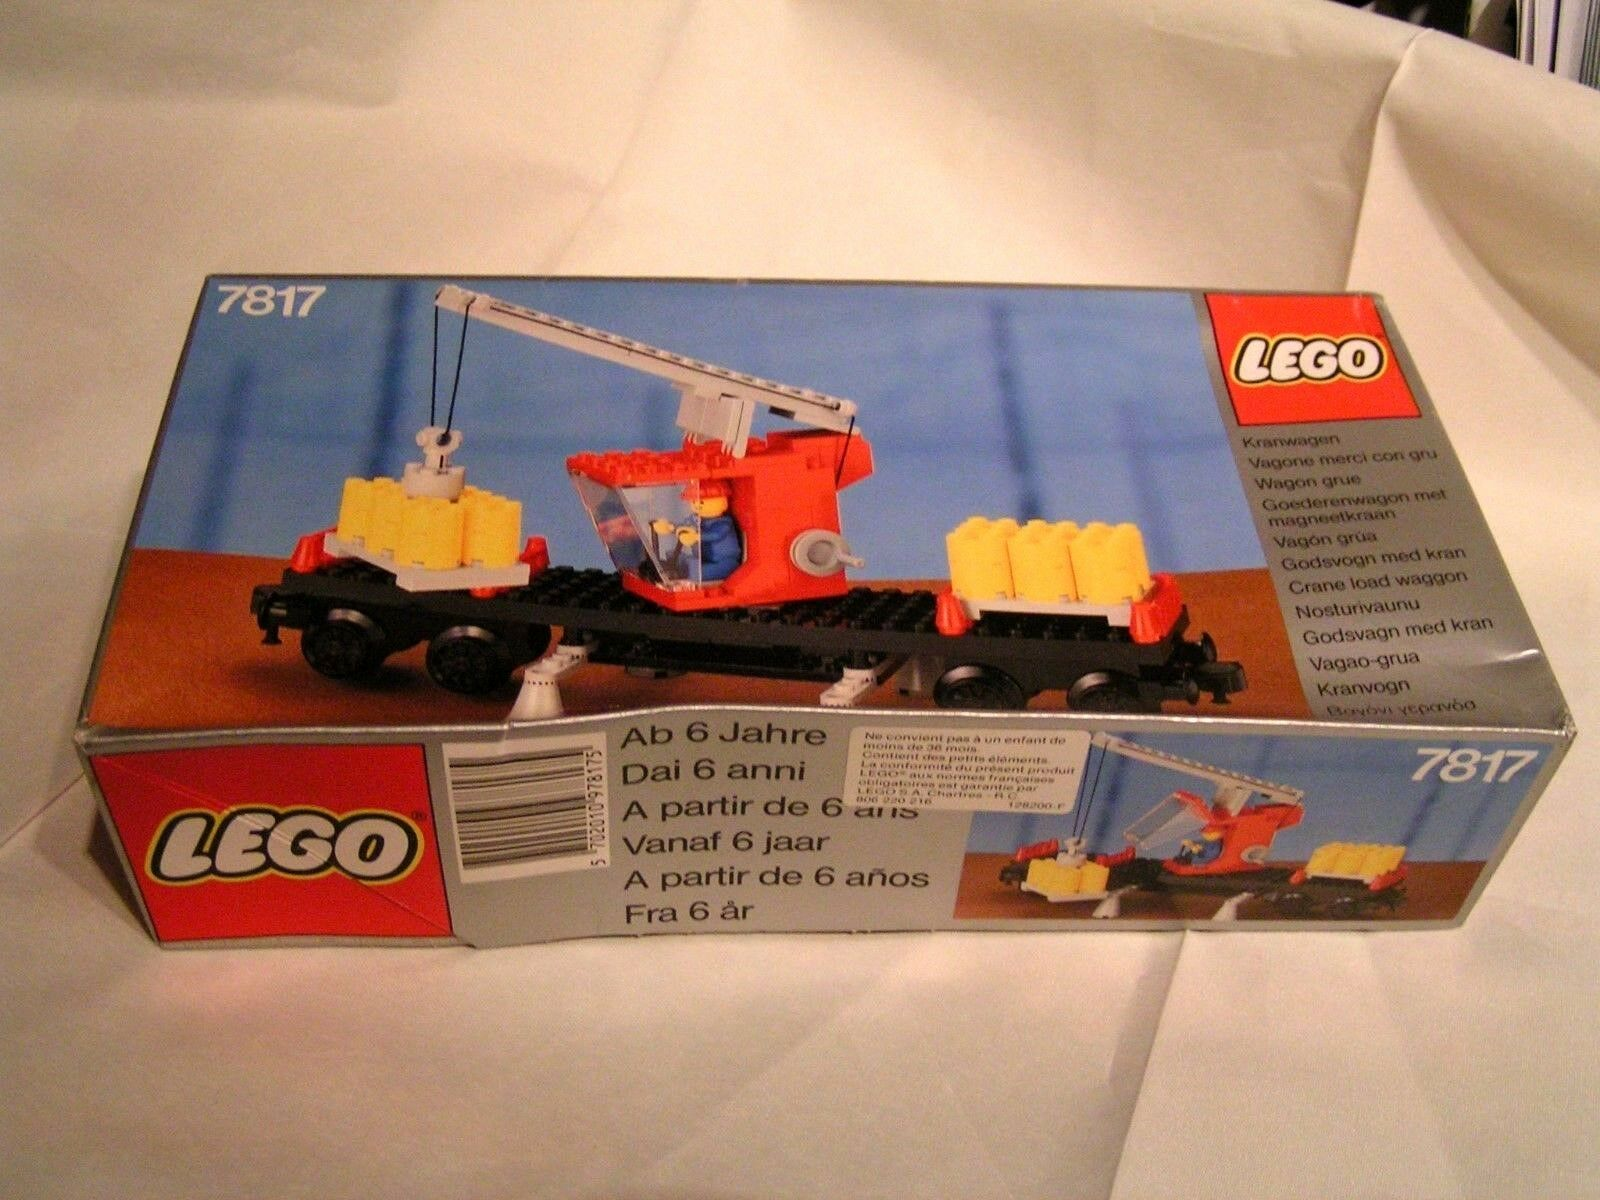 LEGO TRAIN   -     WAGON GRUE (CRANE) COMPLET  ref. 7817  EN BOÏTE - TRES RARE c9a717